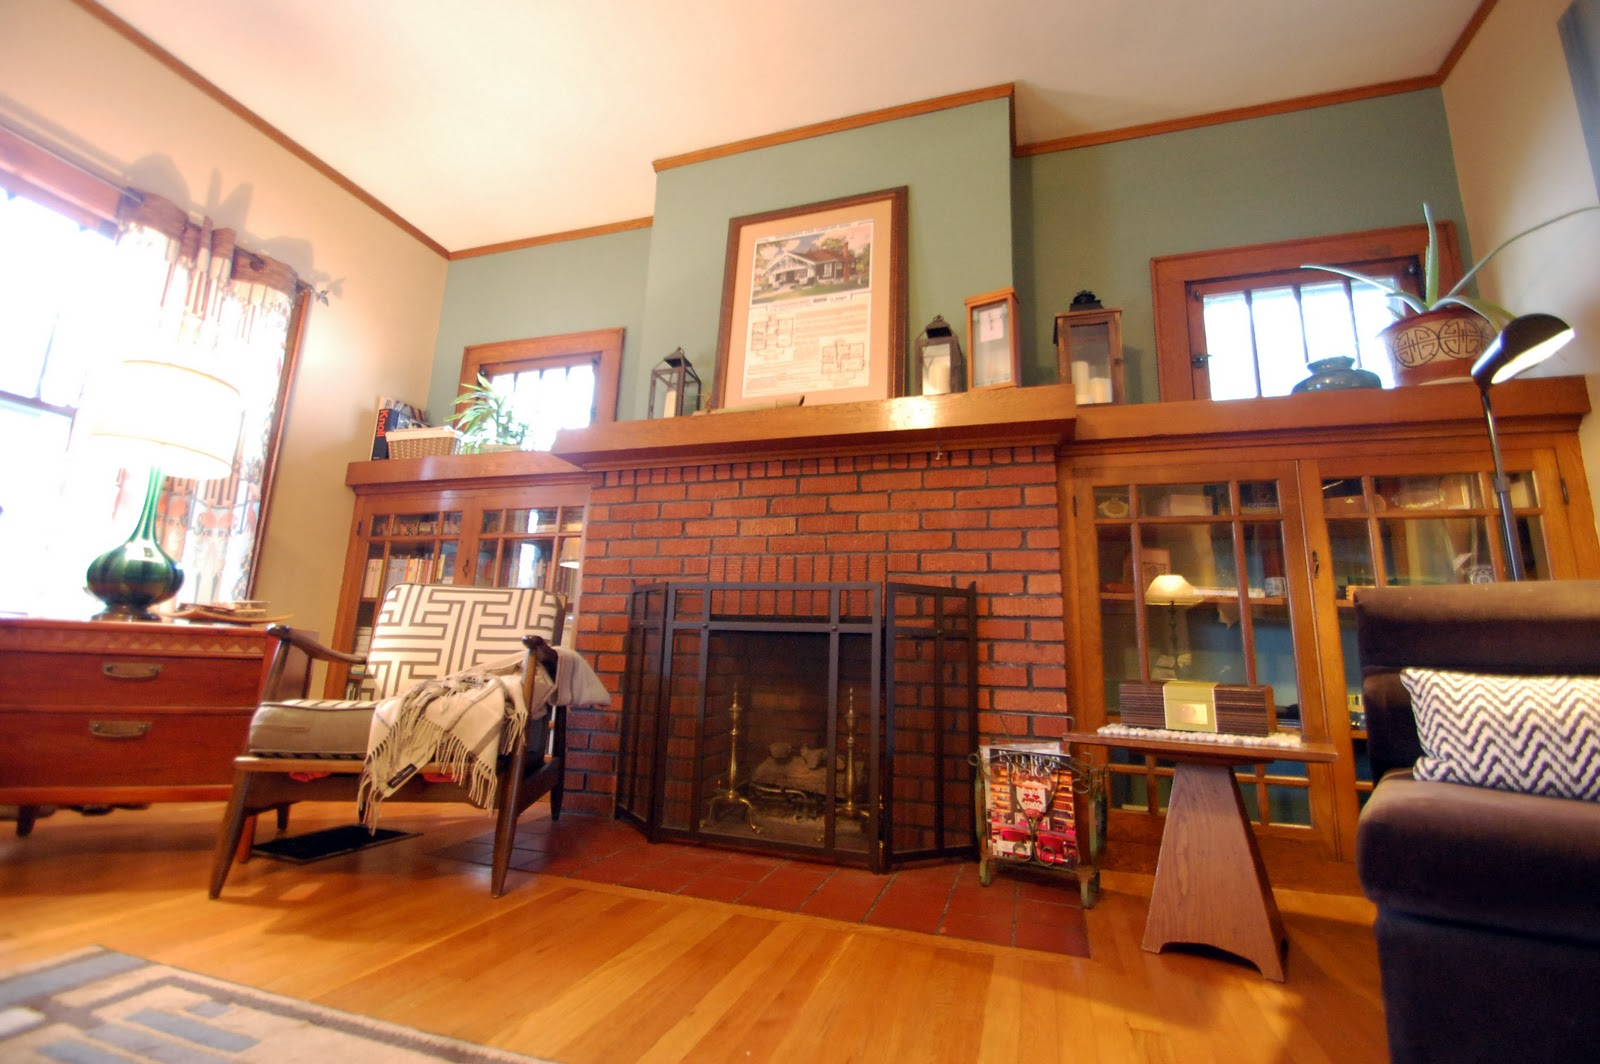 DIY On Pinterest Hollow Core Doors Interior Doors And Crafts